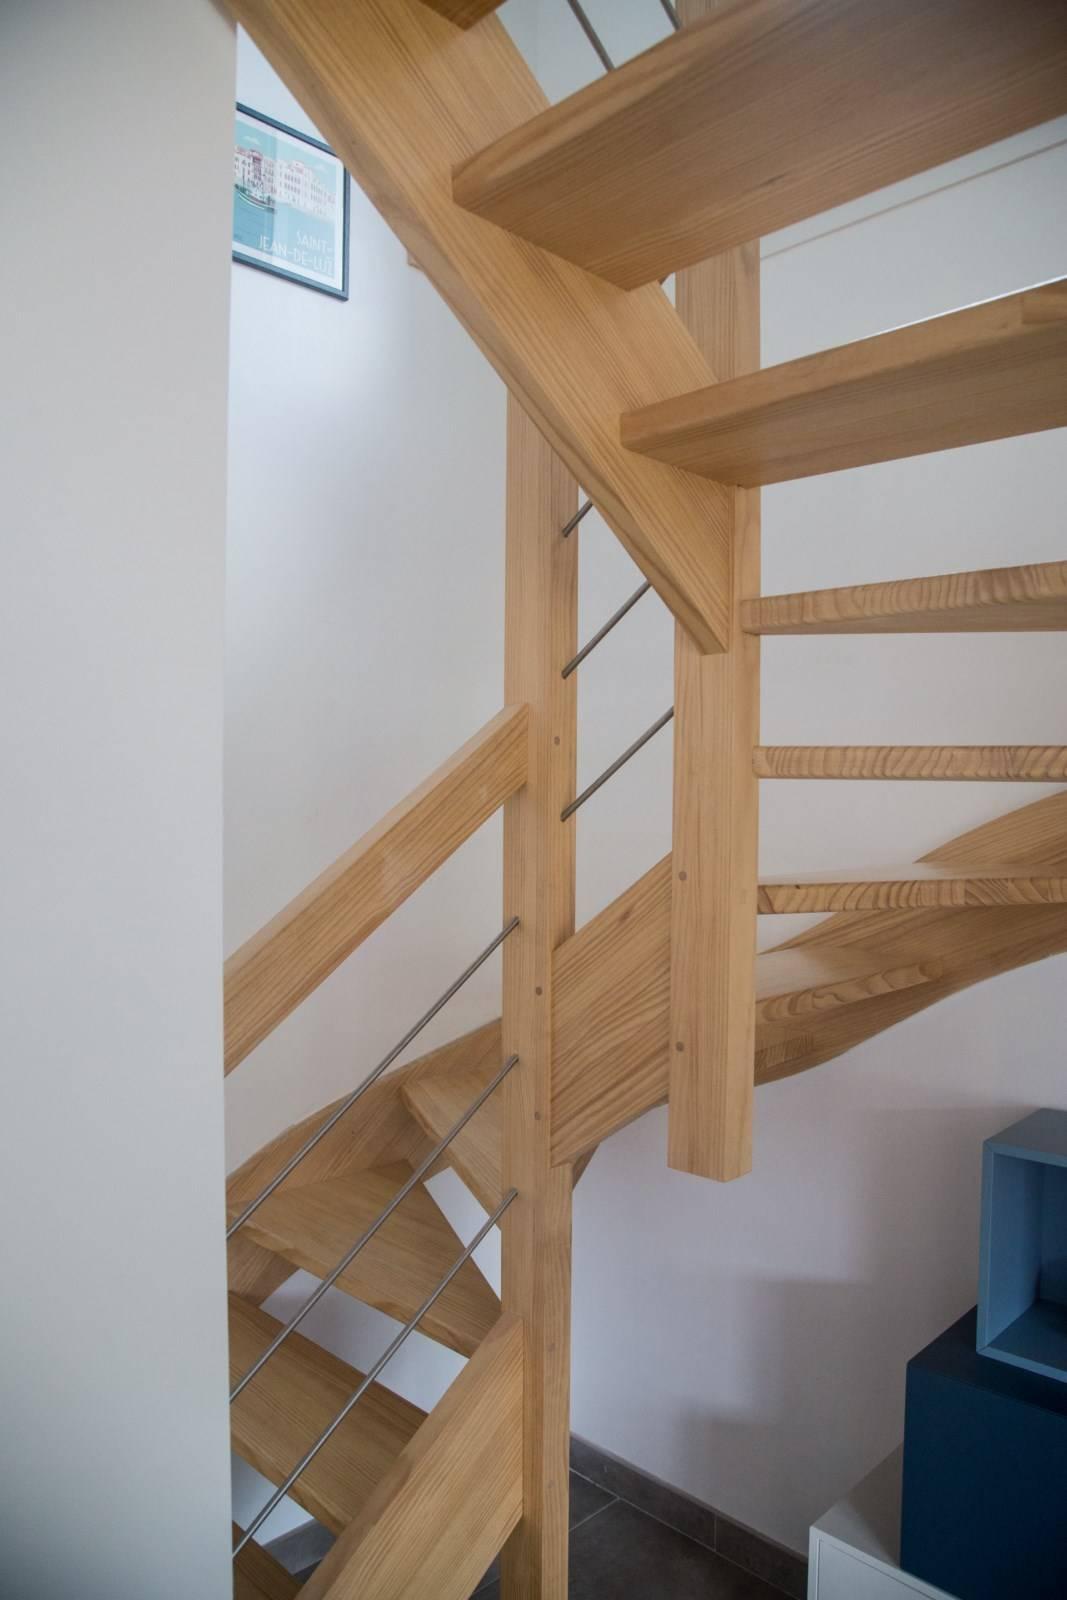 fabriquer un escalier bois rambarde m tal inox bayonne. Black Bedroom Furniture Sets. Home Design Ideas